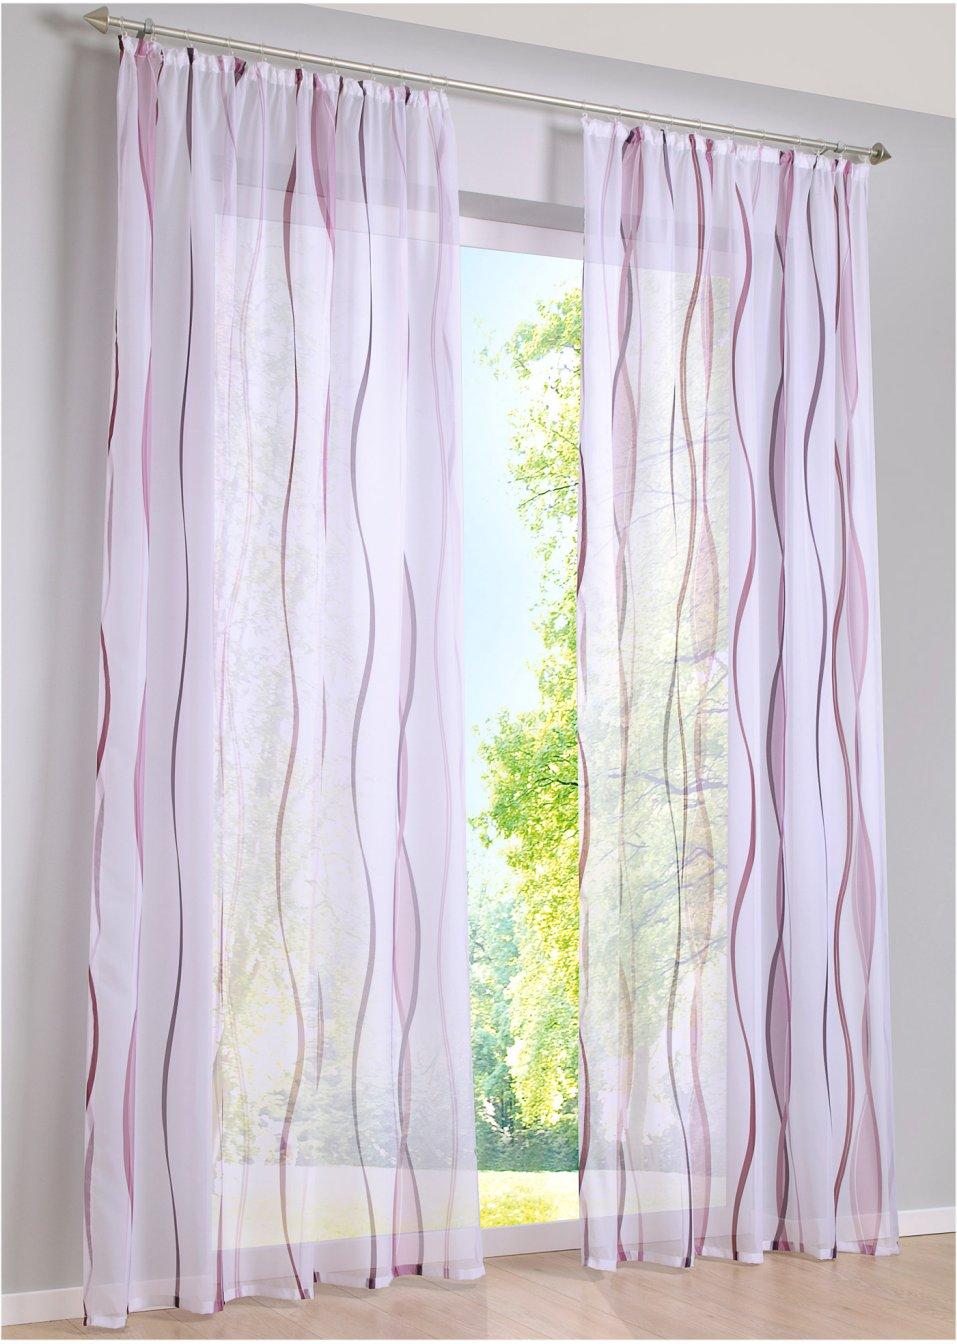 luftig leichte gardine vienna in transparenter optik wei beere kr uselband 1er pack. Black Bedroom Furniture Sets. Home Design Ideas